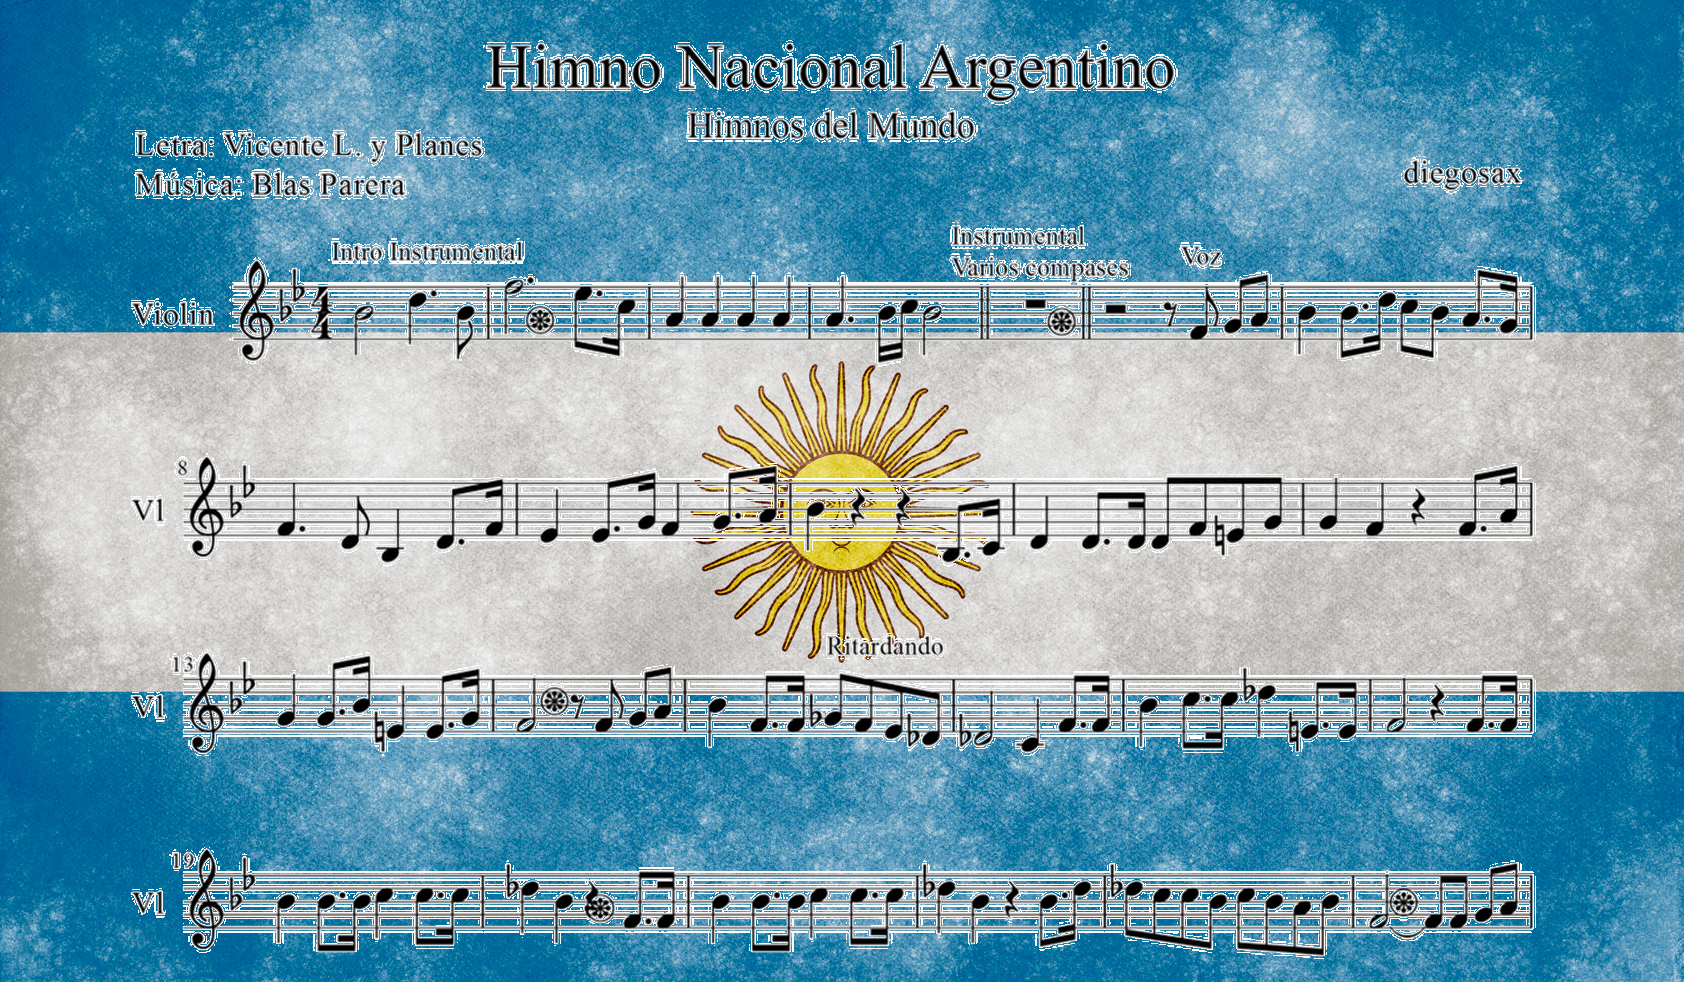 Bandera Argentina - Himno nacional argentino